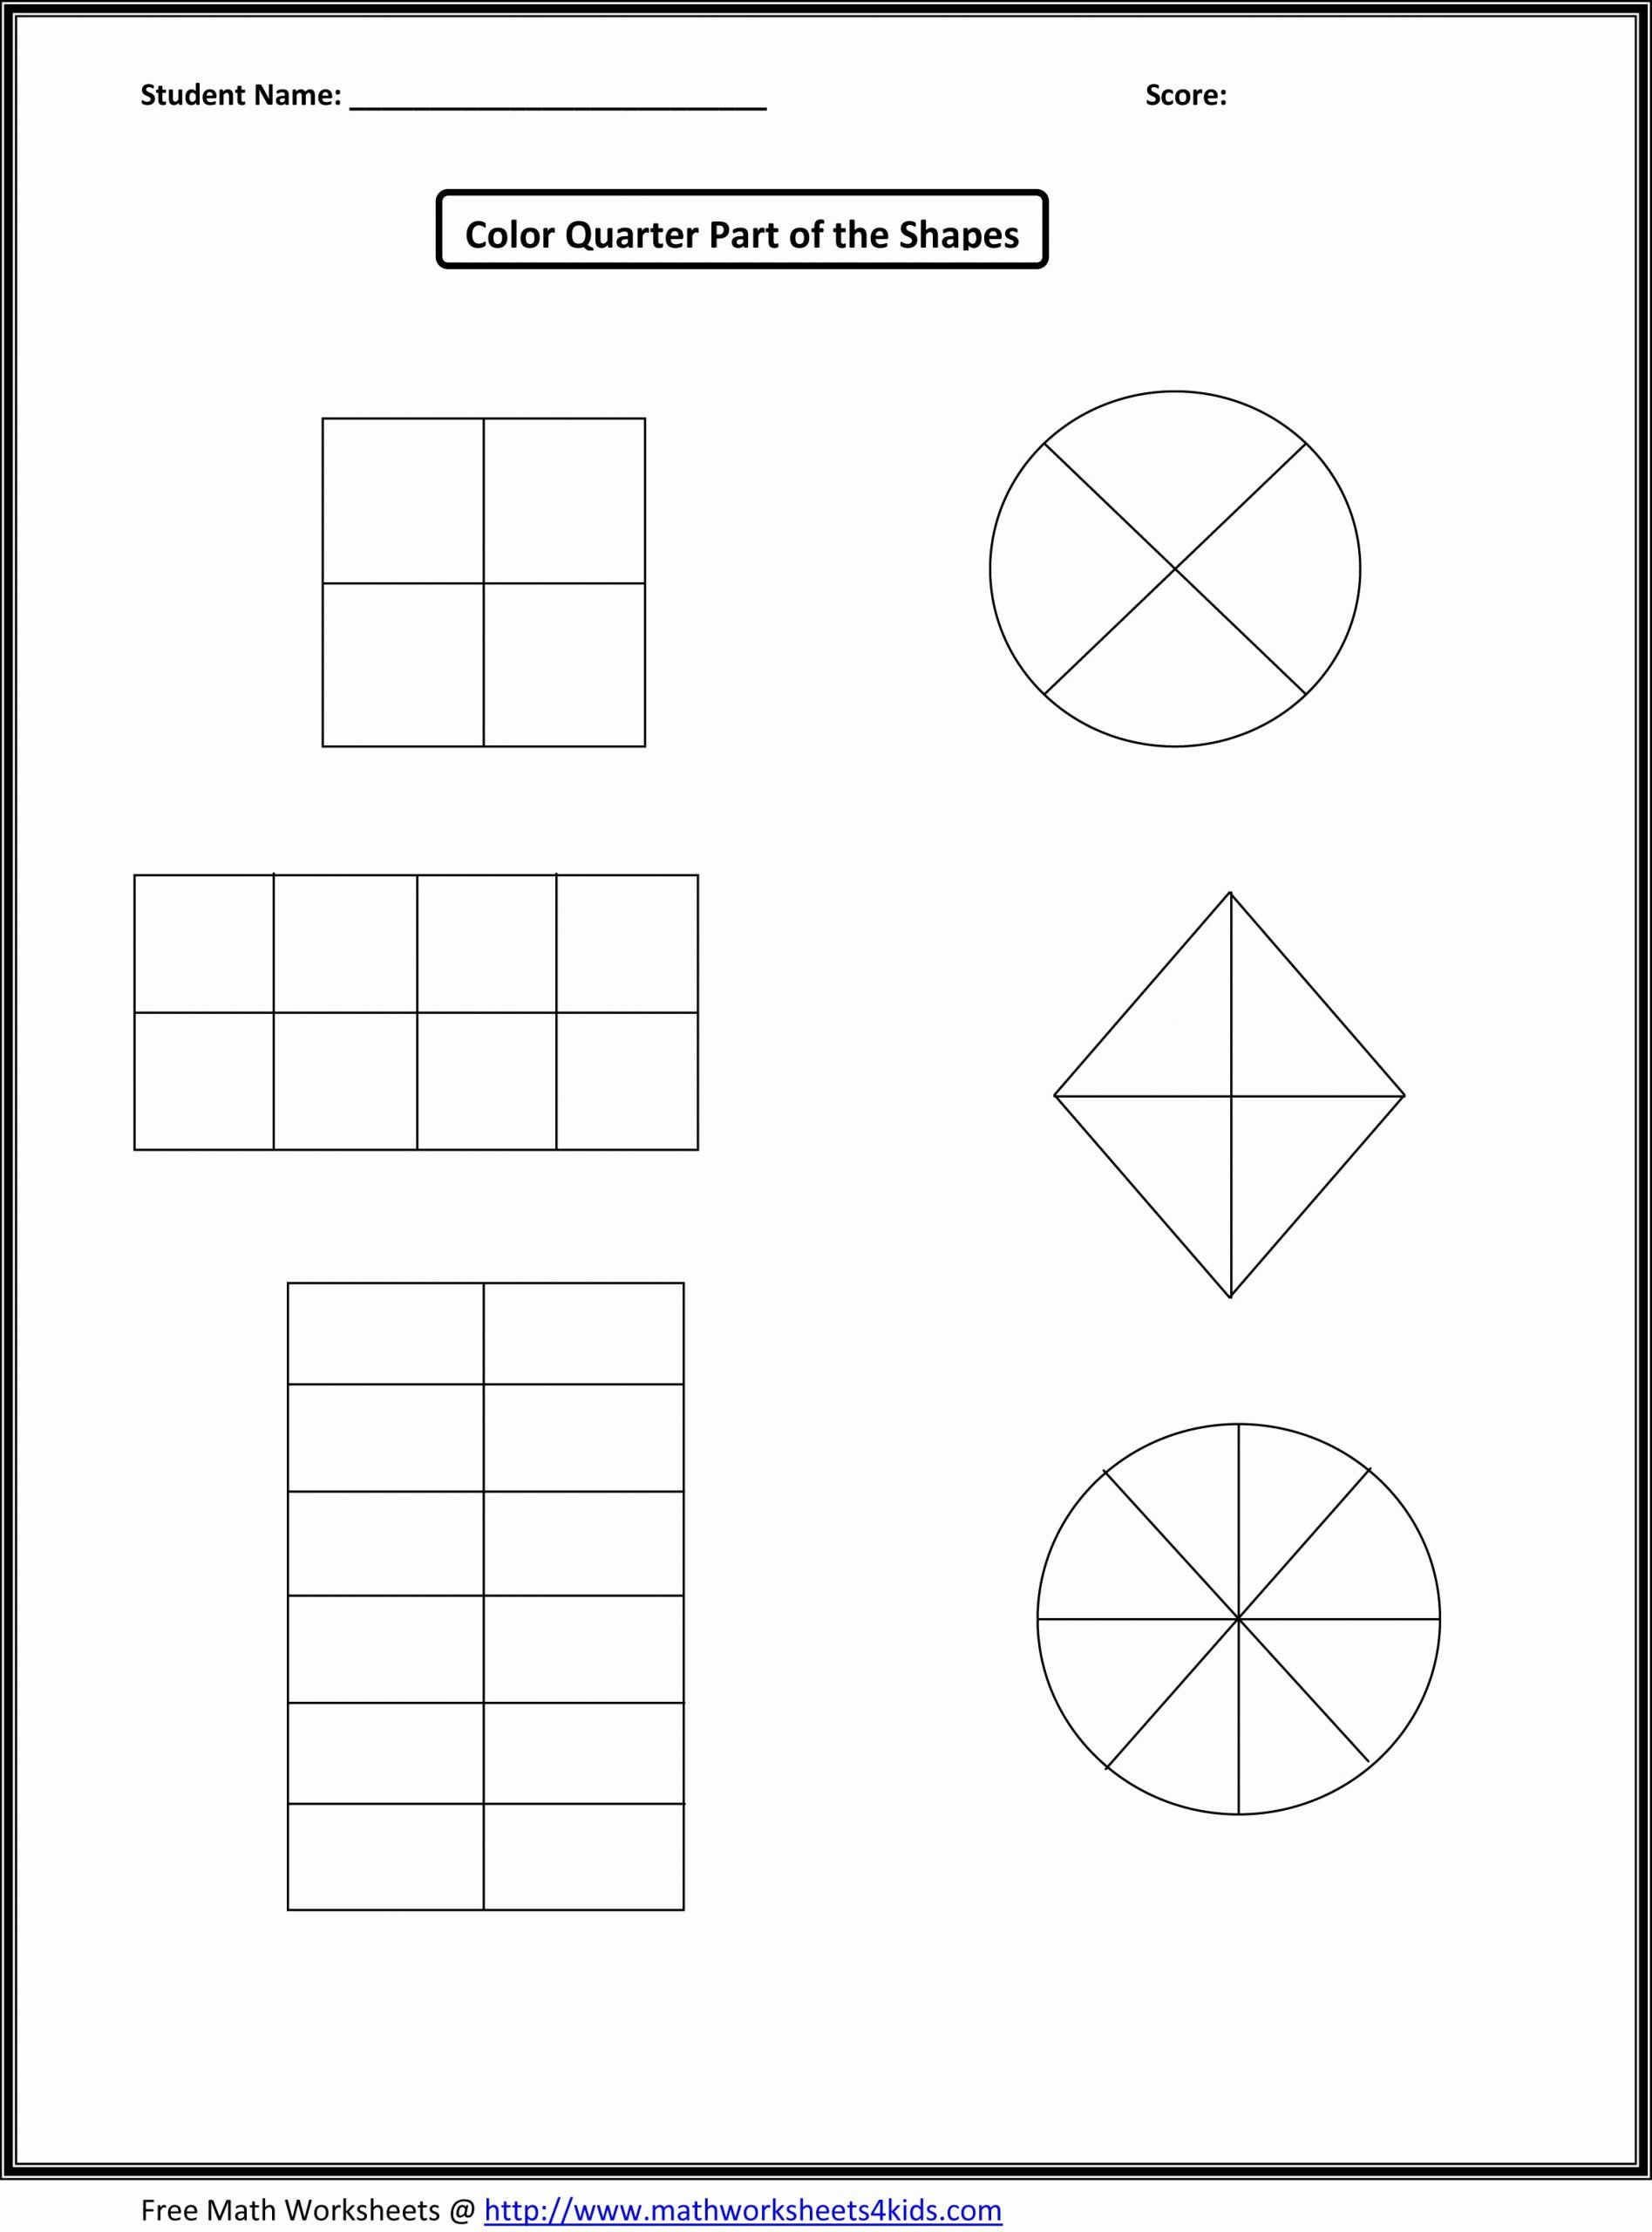 Free First Grade Fraction Worksheets Fresh This Would Work for First Grade Fraction Number Sense